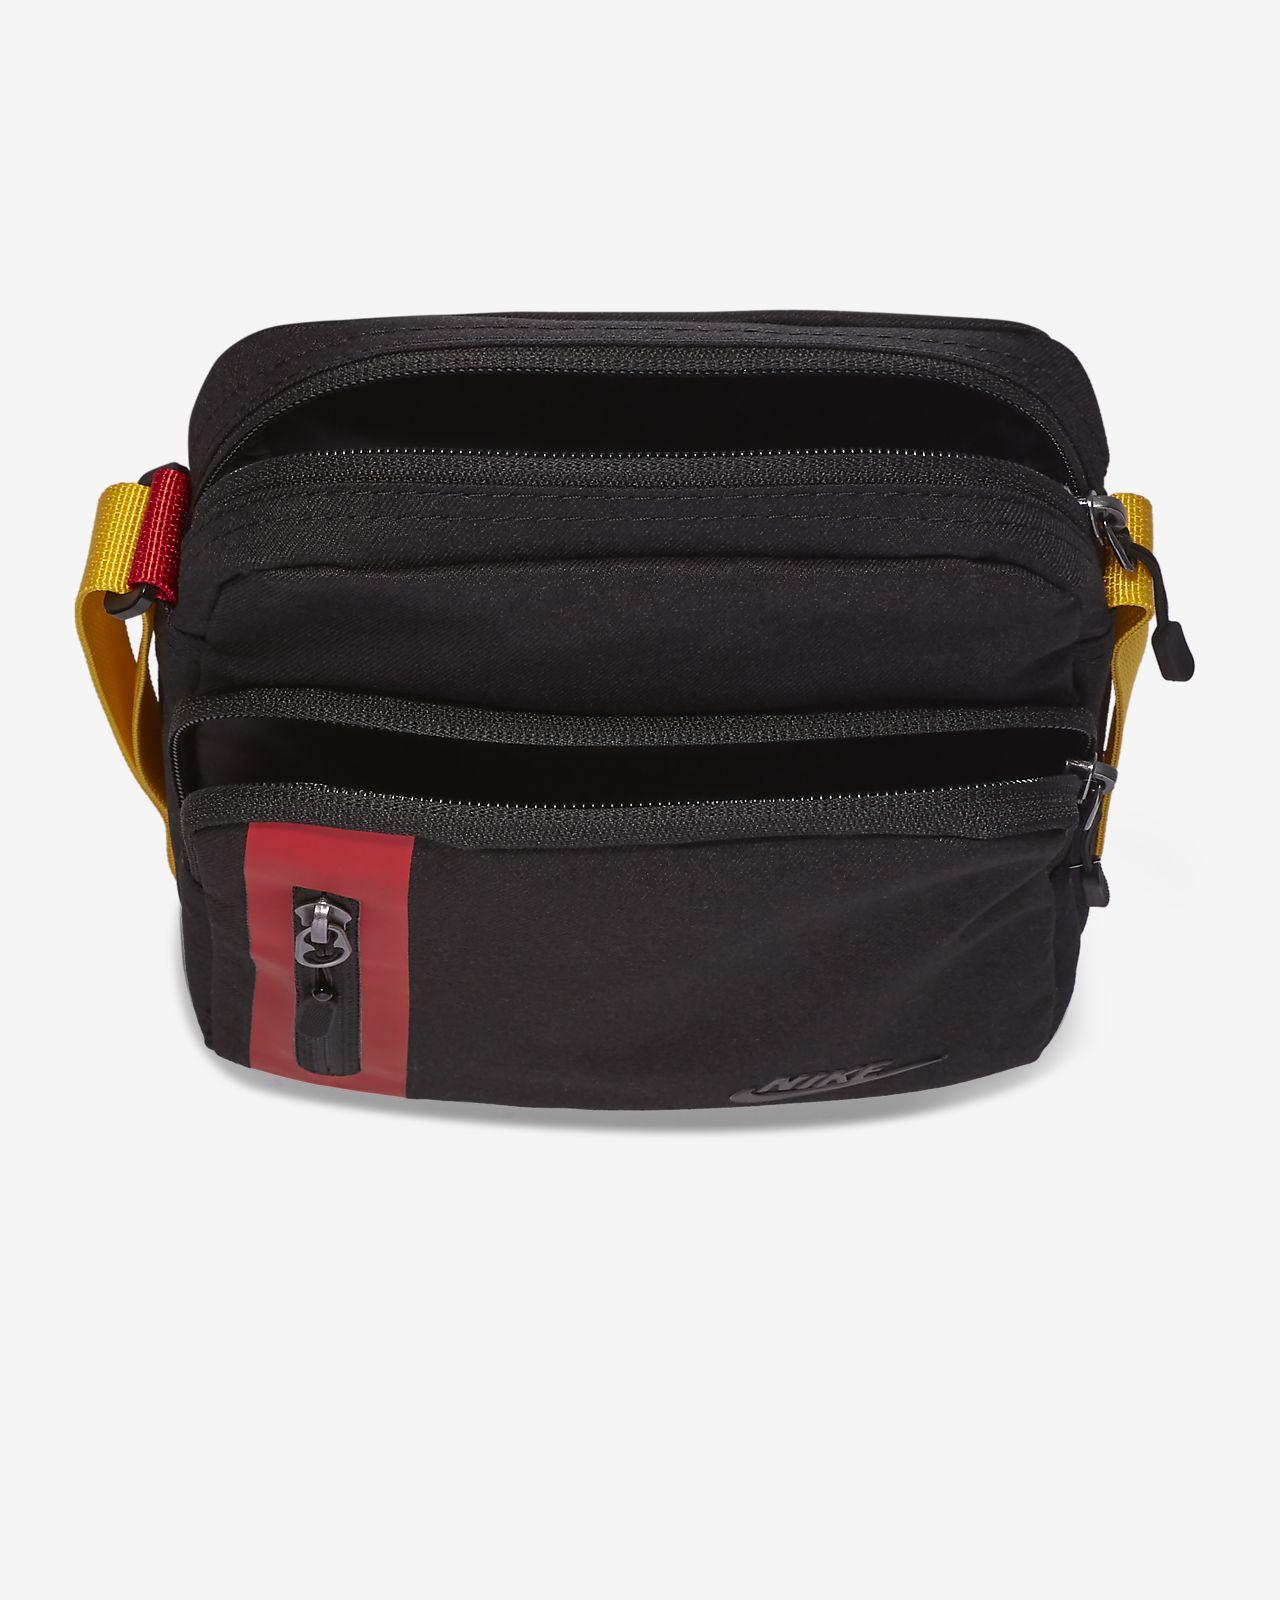 6b400686d Bolso Nike Core Small Items 3.0. Nike.com CL